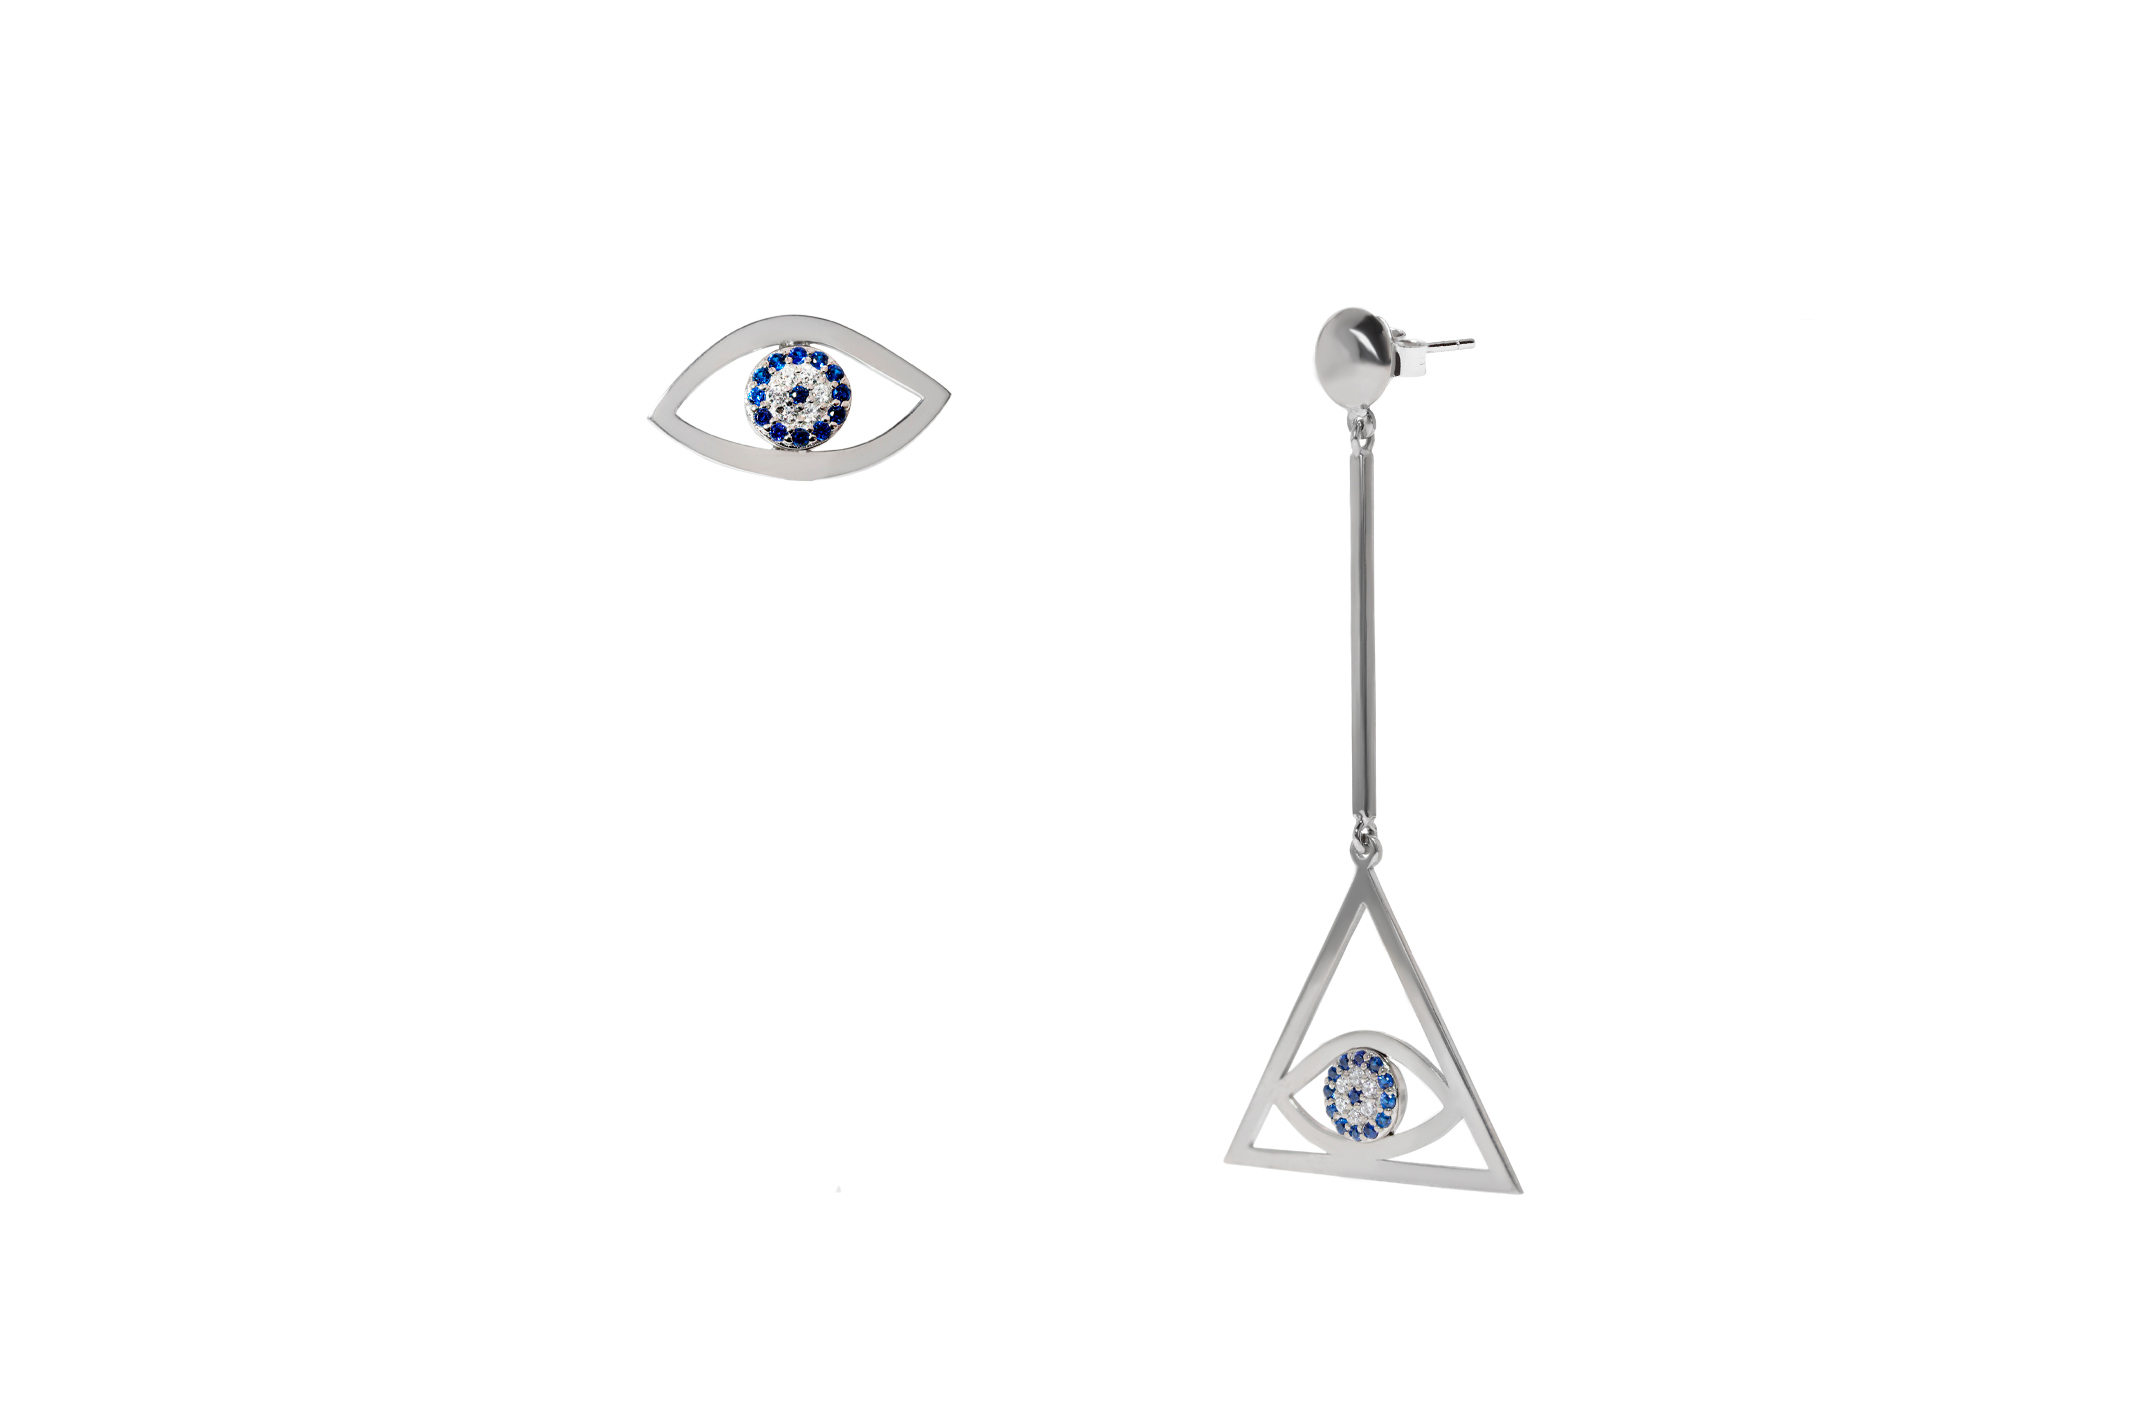 Joia: brincos;Material: prata 925;Pedras: zirconias;Cor: branco;Género: mulher